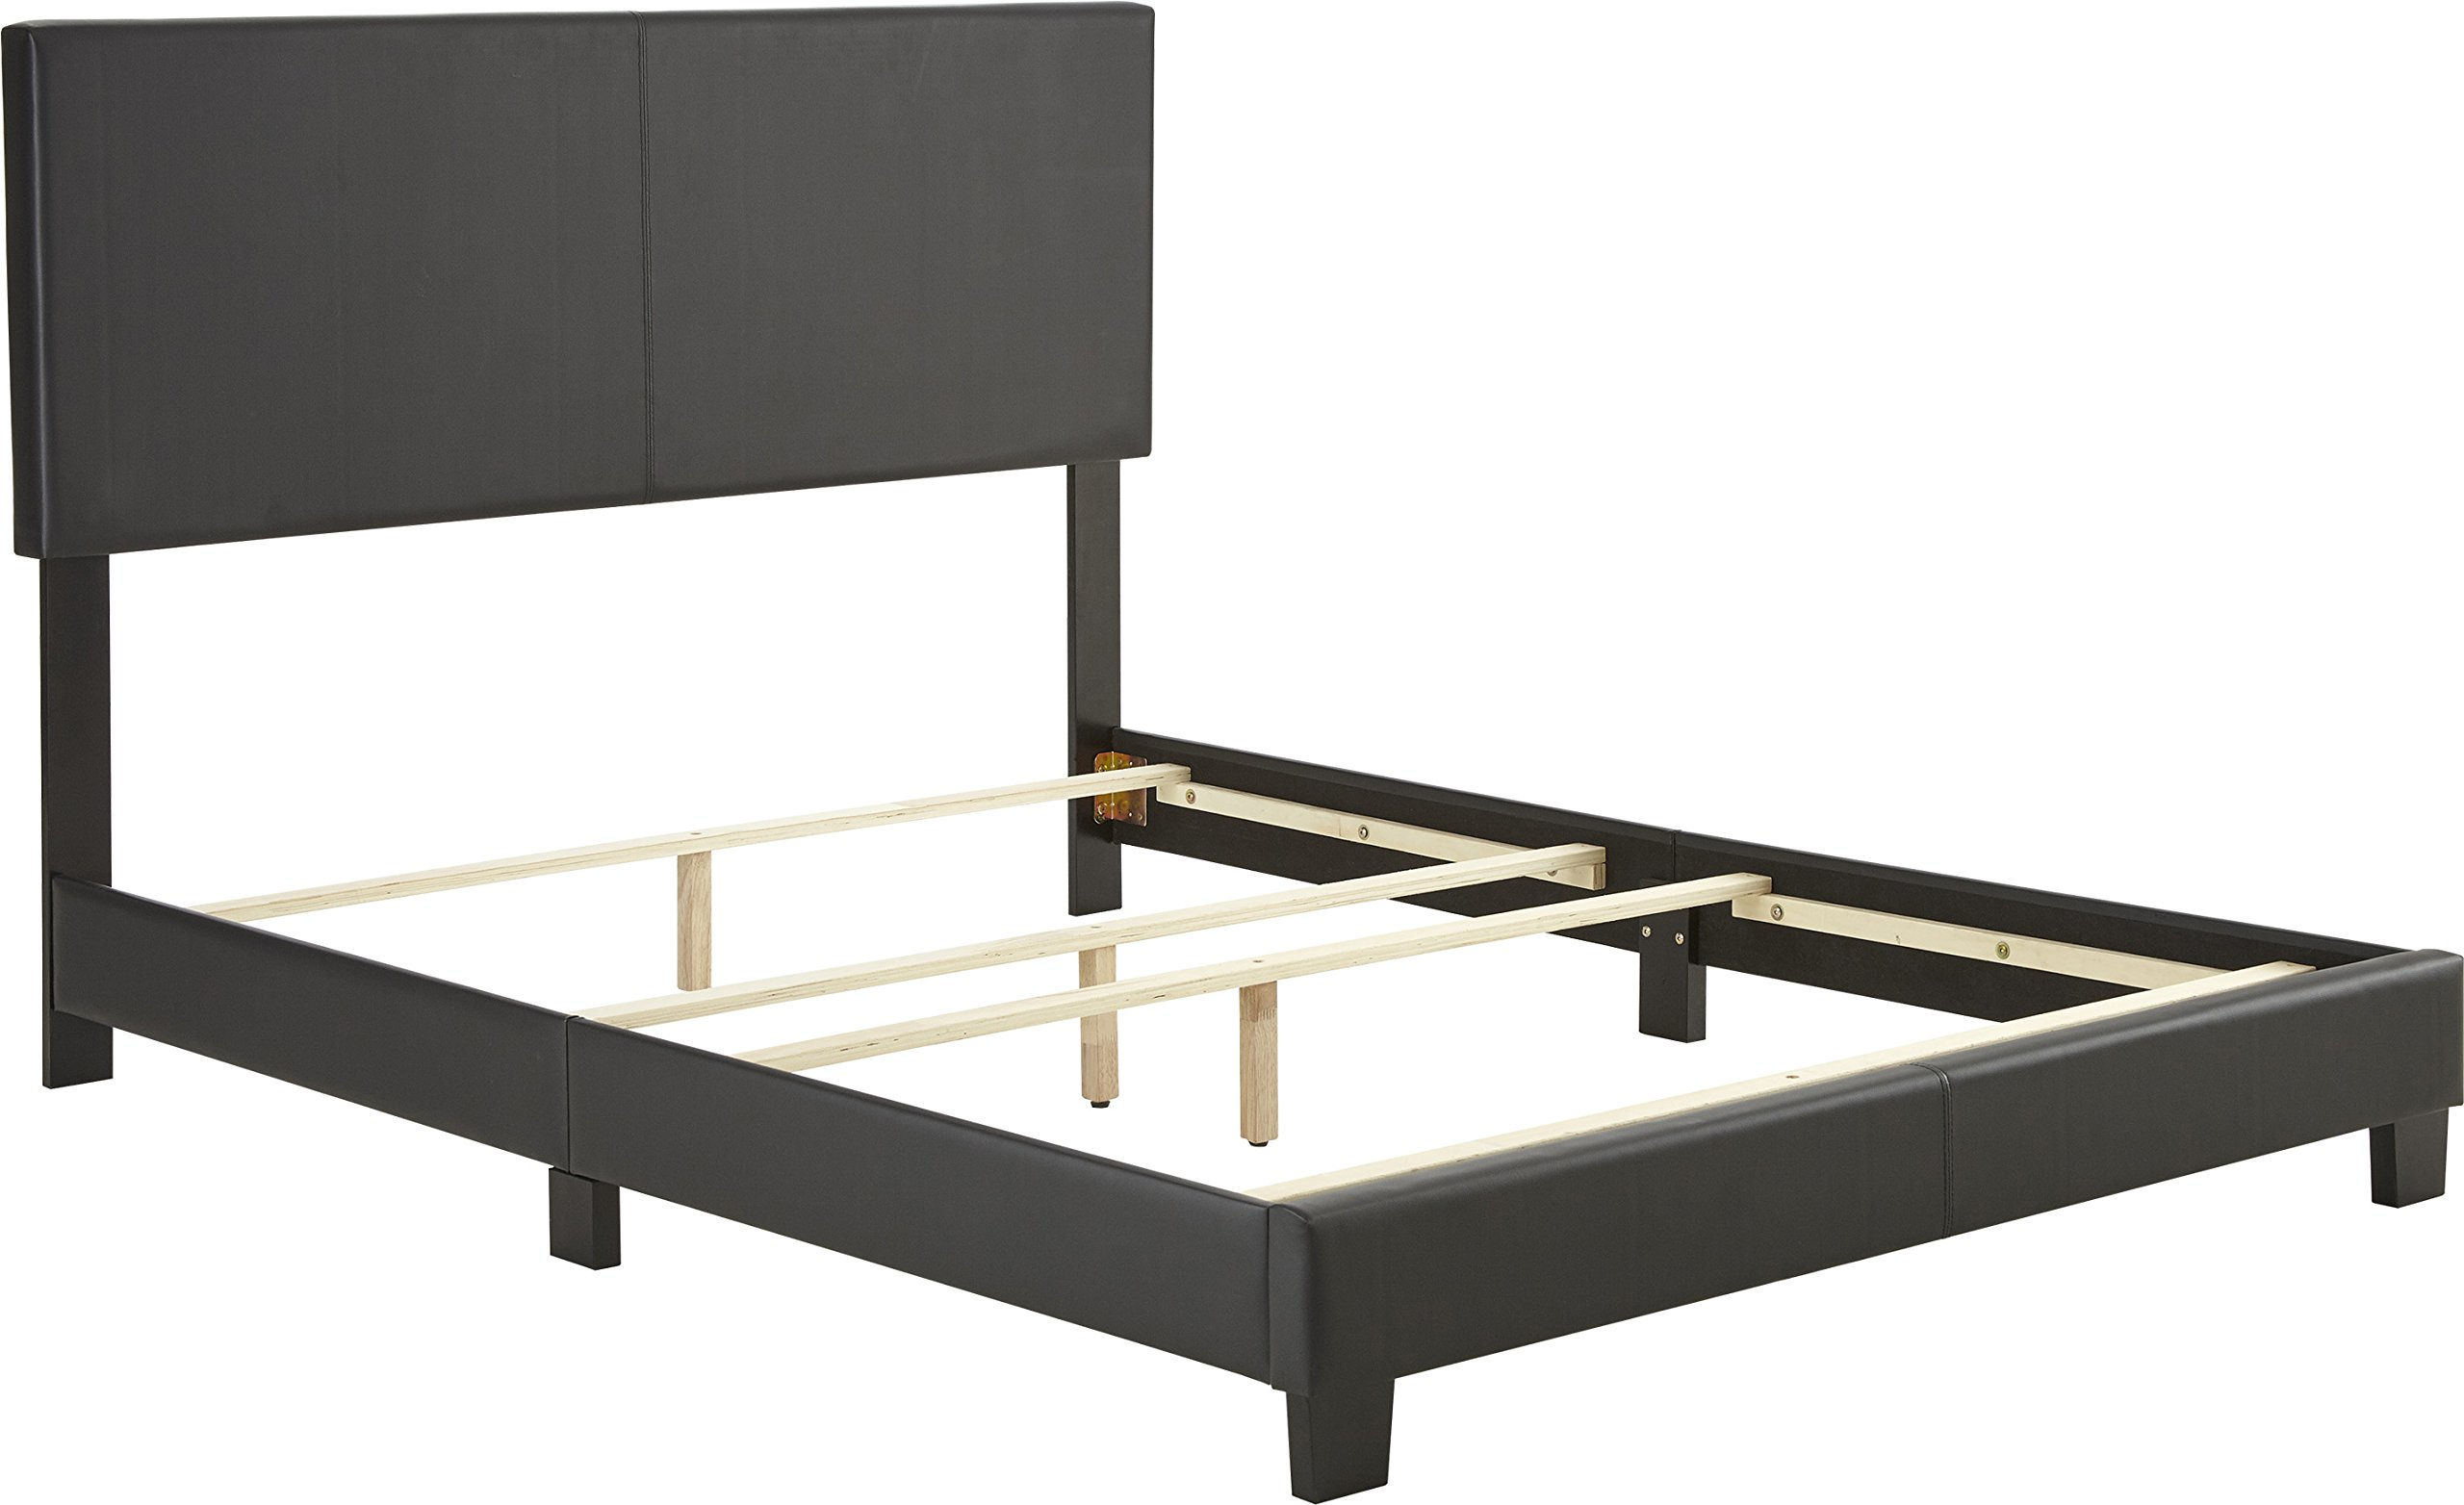 Flex Form Montana Upholstered Platform Bed Frame with Headboard: Faux Leather, Black, King by Flex Form